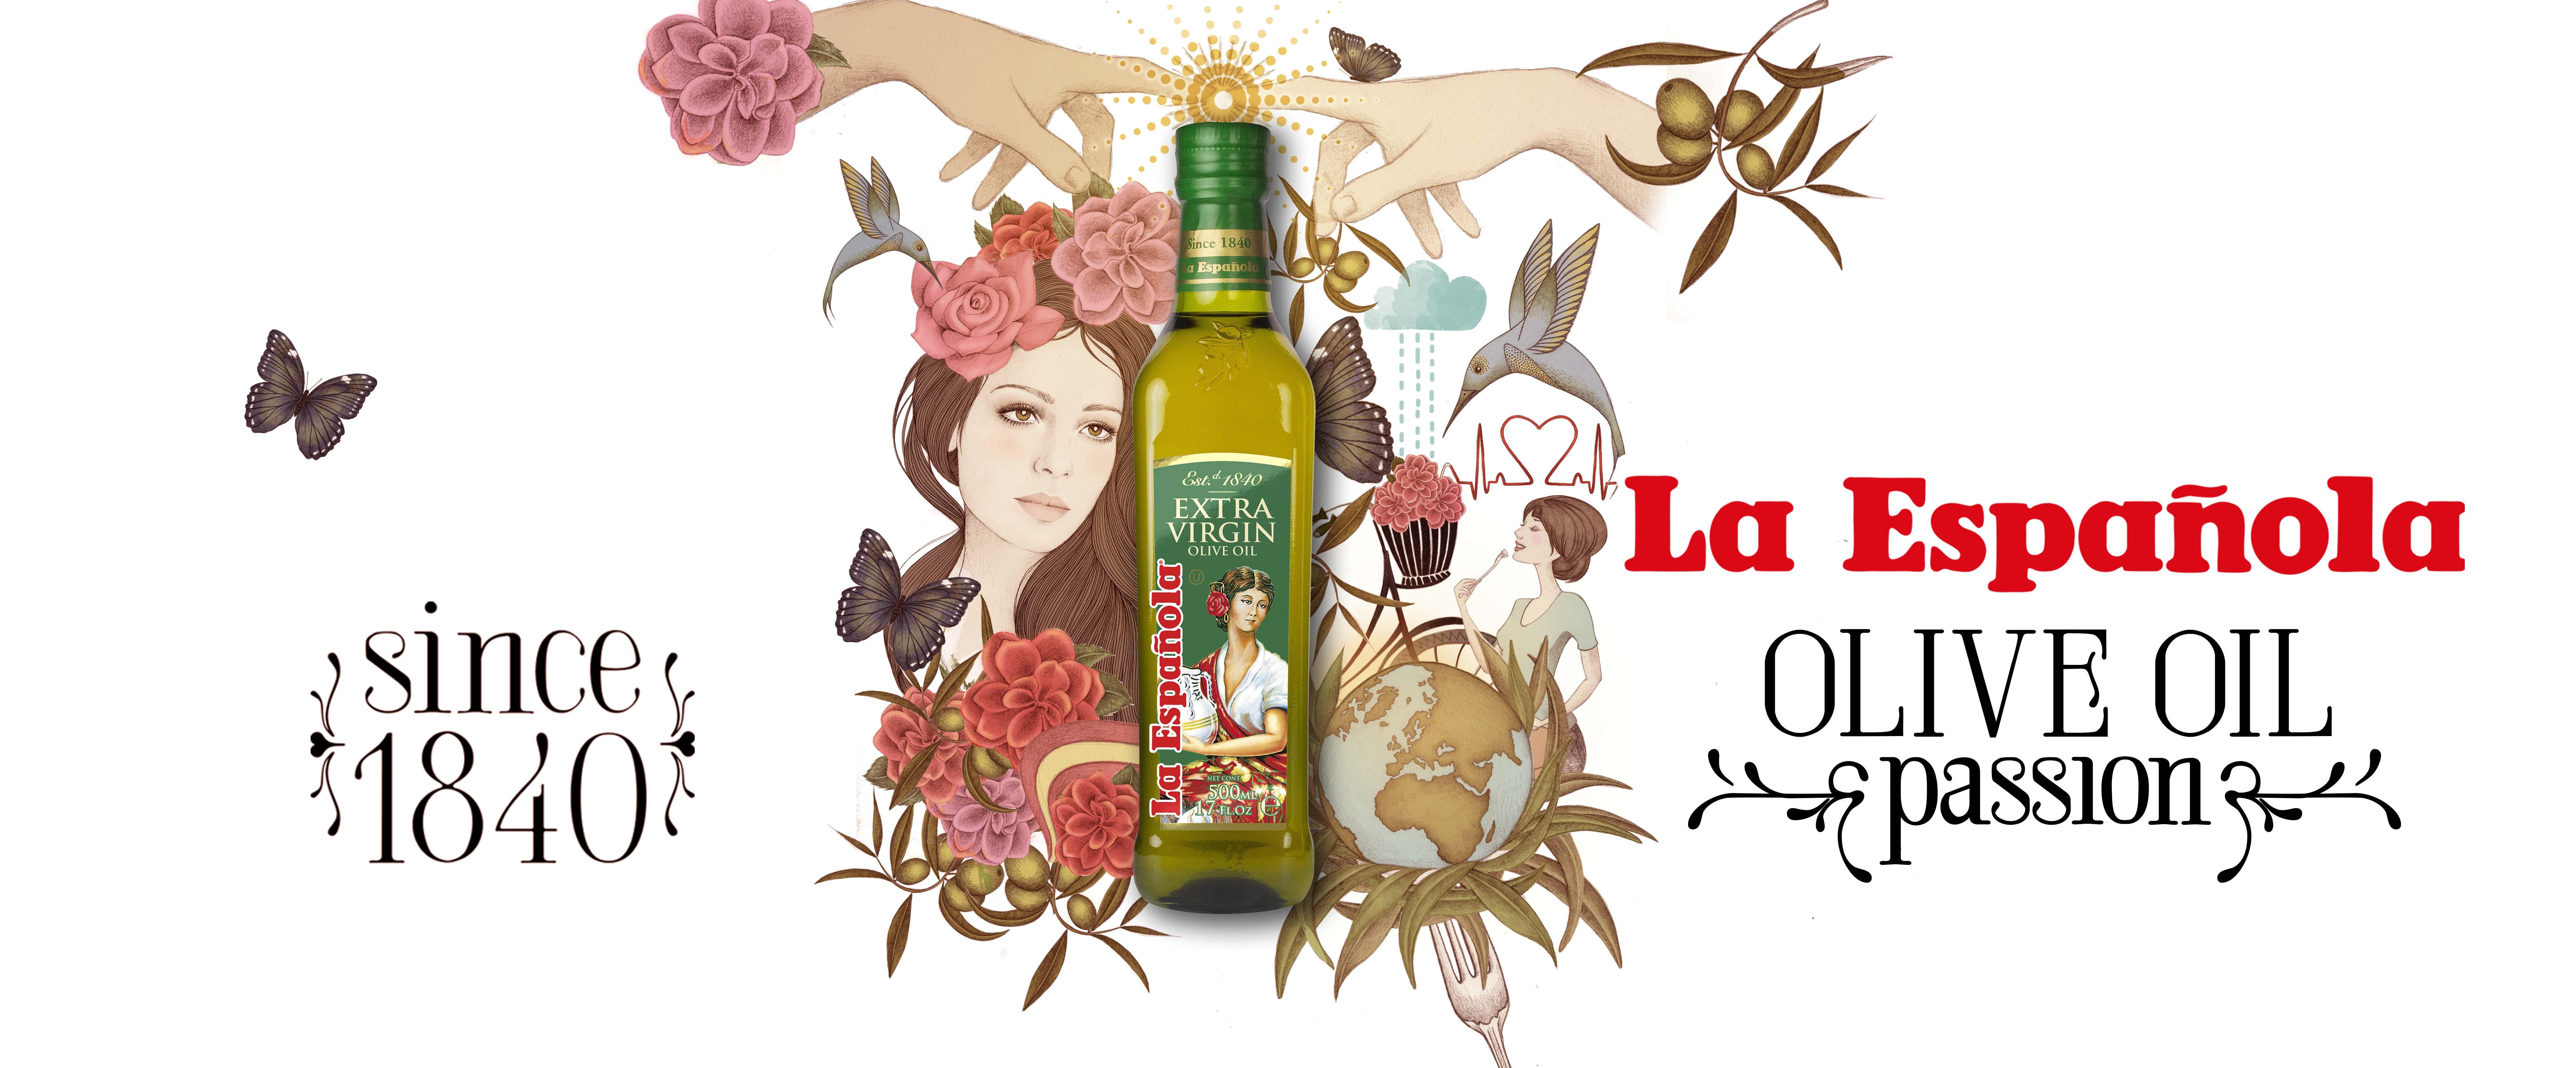 https://www.marcasrenombradas.com/wp-content/uploads/2014/07/laespanola-4.jpg